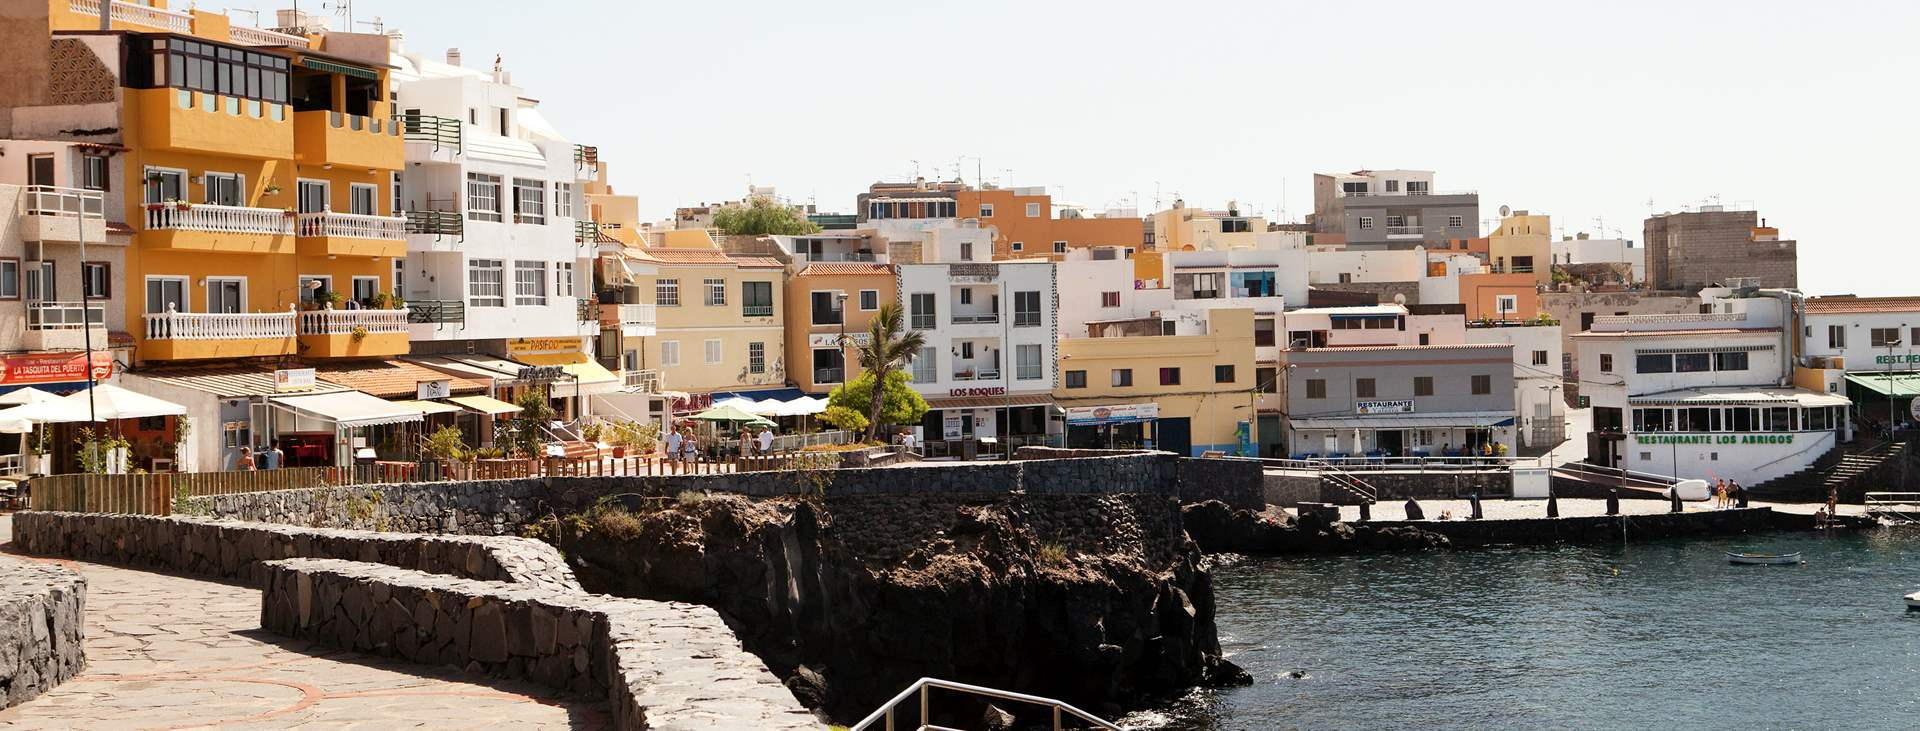 Bestill en reise med Ving til San Miguel de Abona på Tenerife